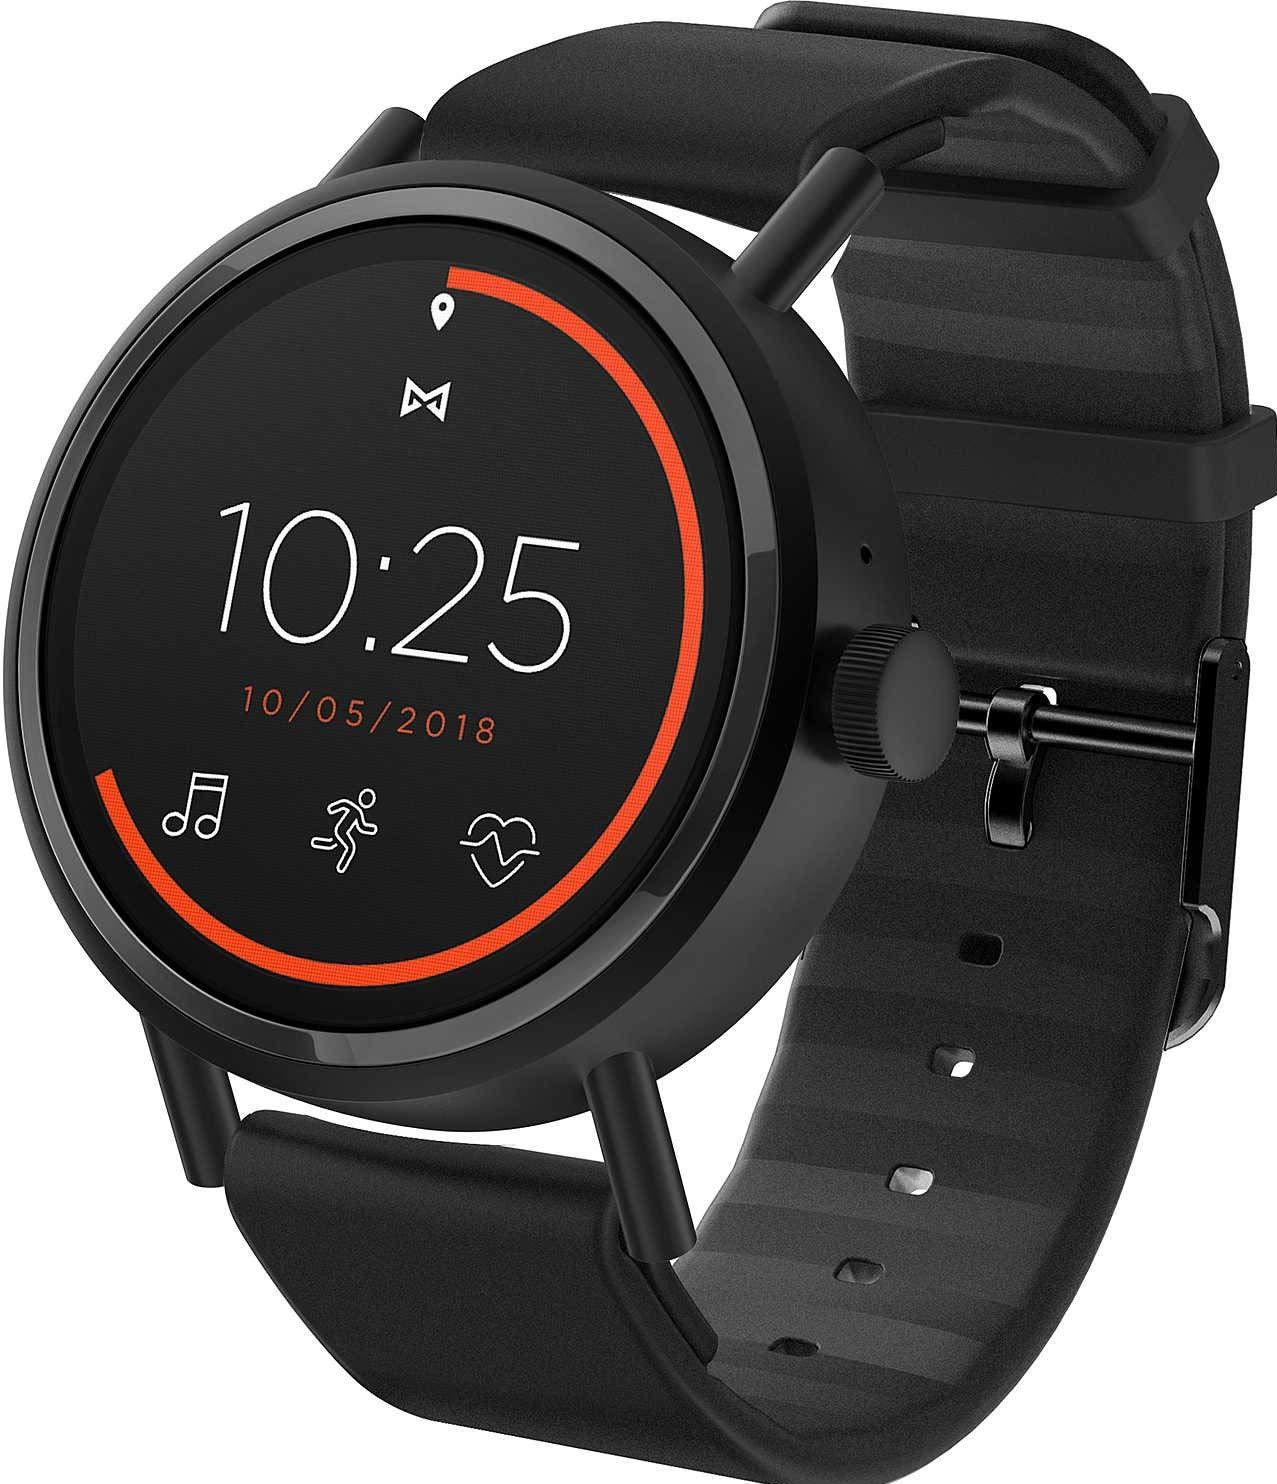 Misfit-Damen-Smartwatch-mit-Silikon-Armband-MIS7100